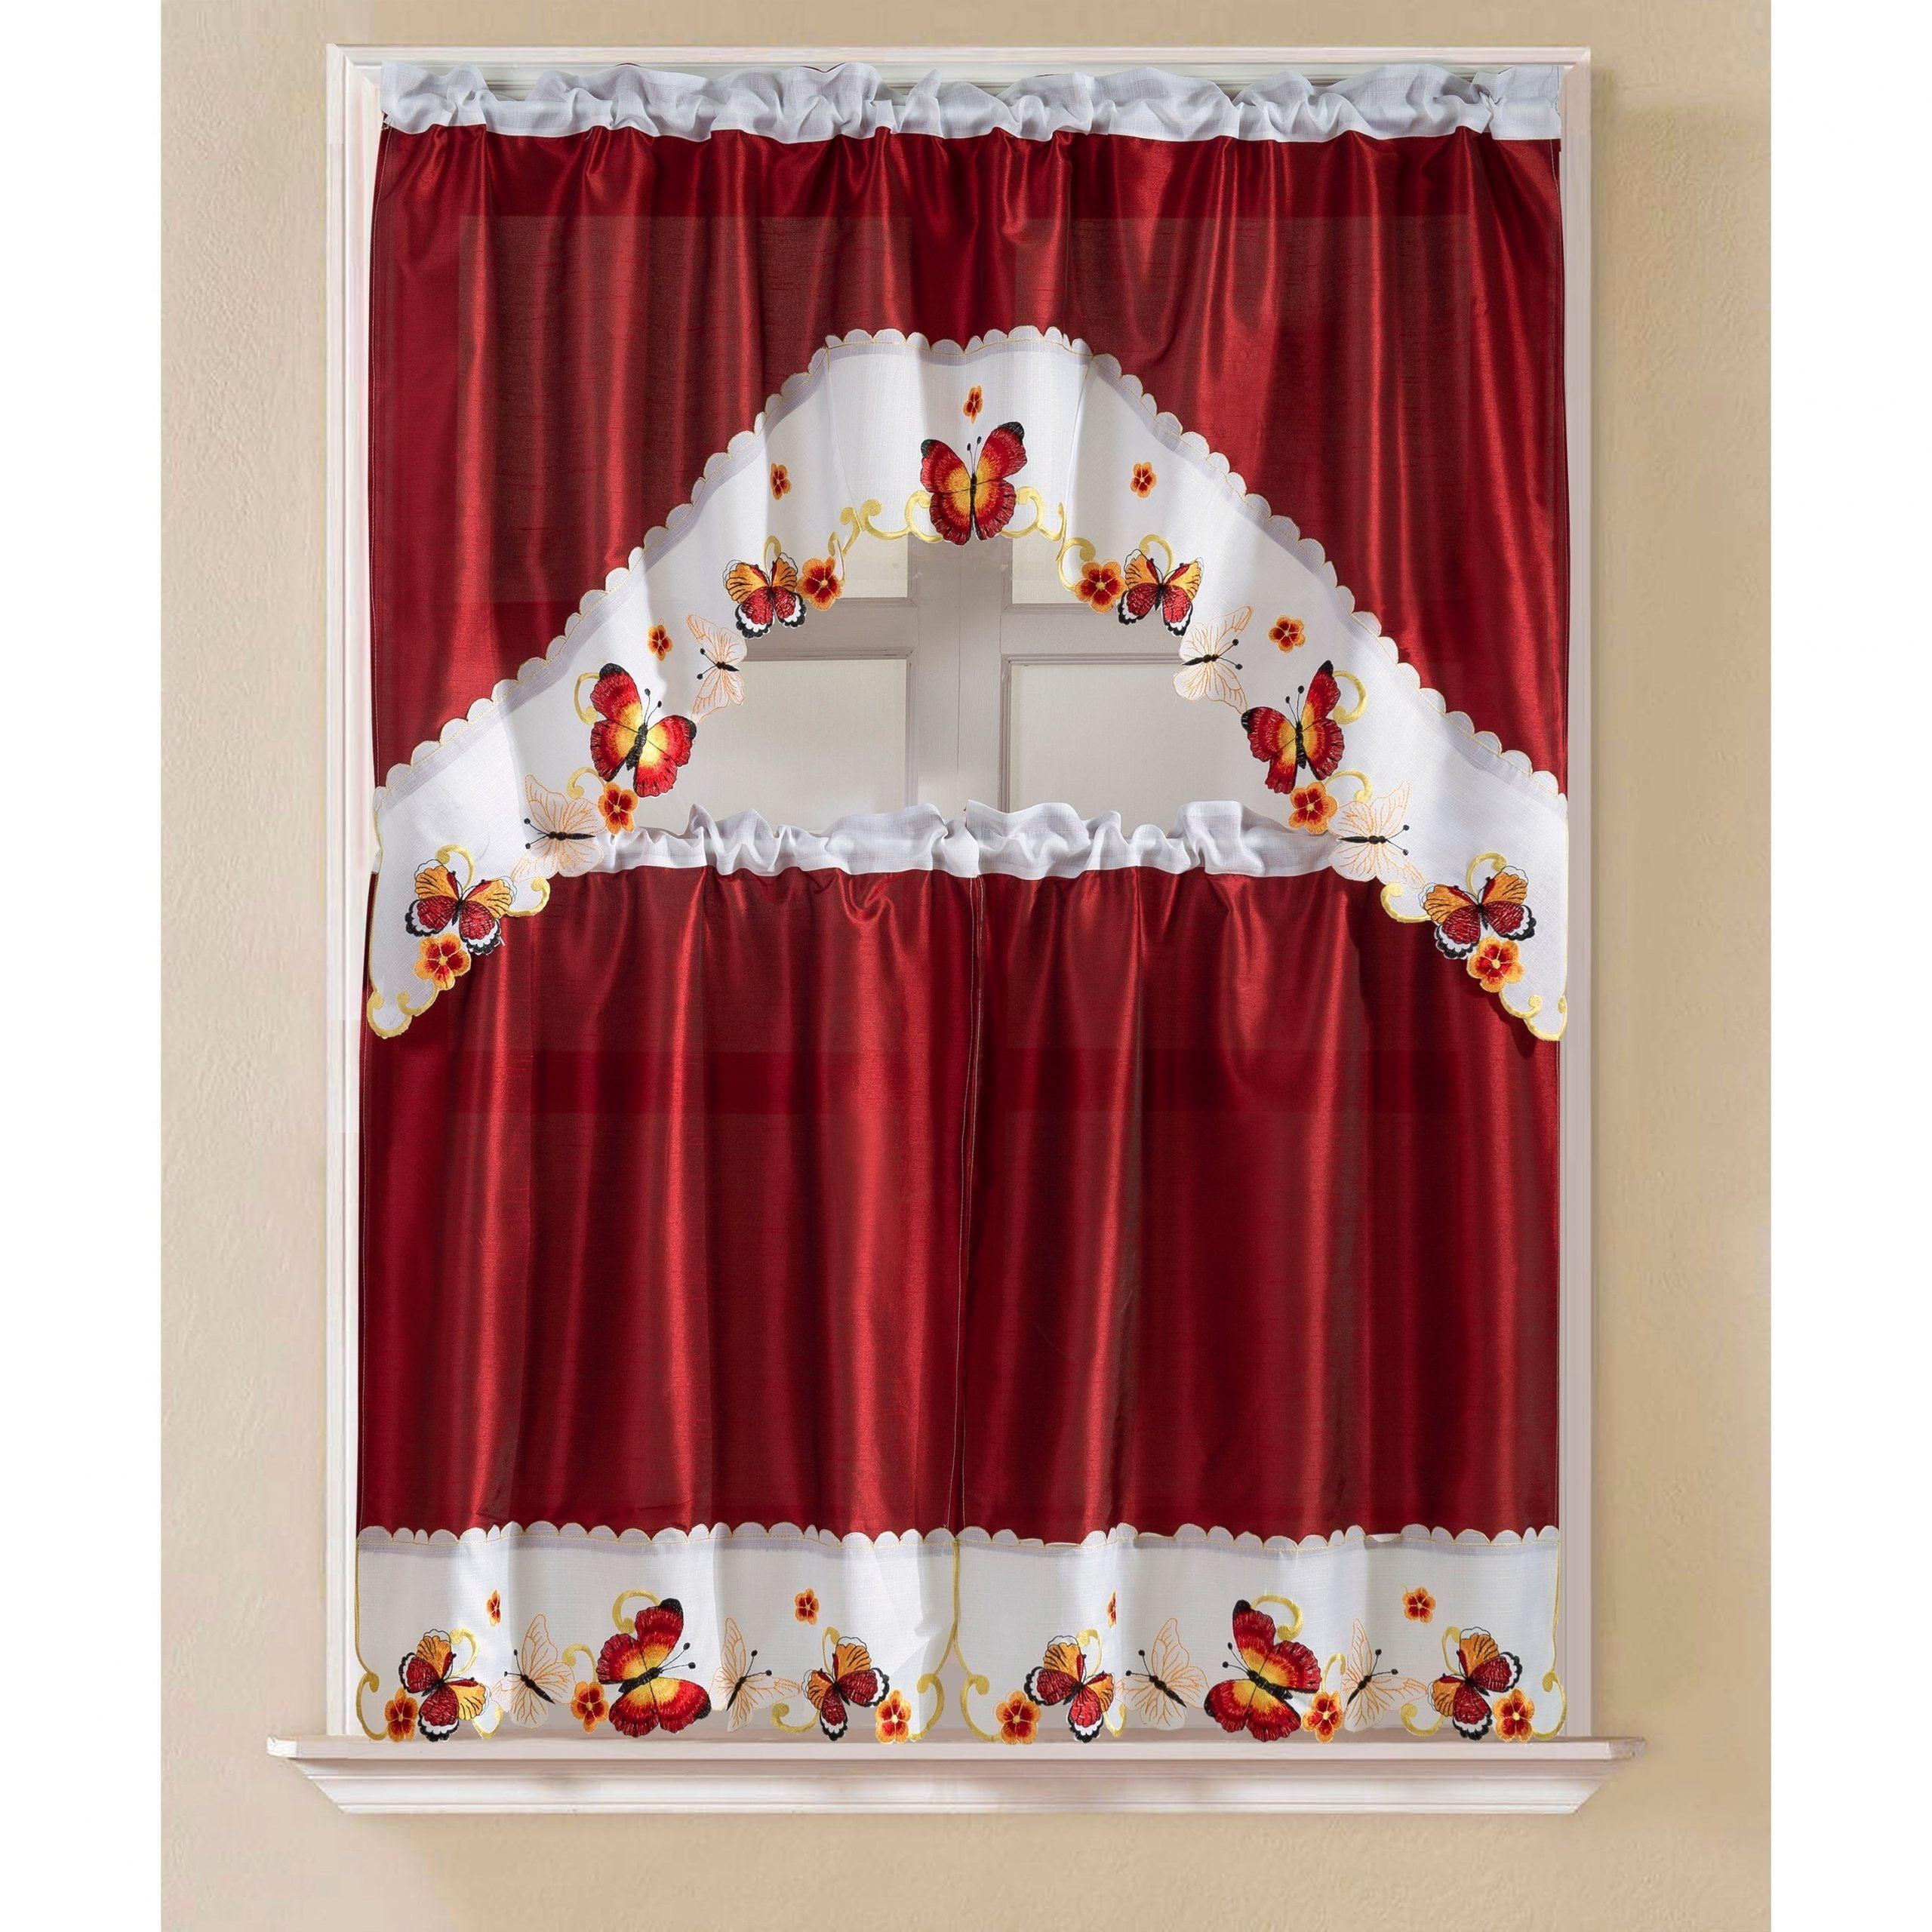 Famous Faux Silk 3 Piece Kitchen Curtain Sets Intended For Porch & Den Eastview Faux Silk 3 Piece Kitchen Curtain Set (View 5 of 20)